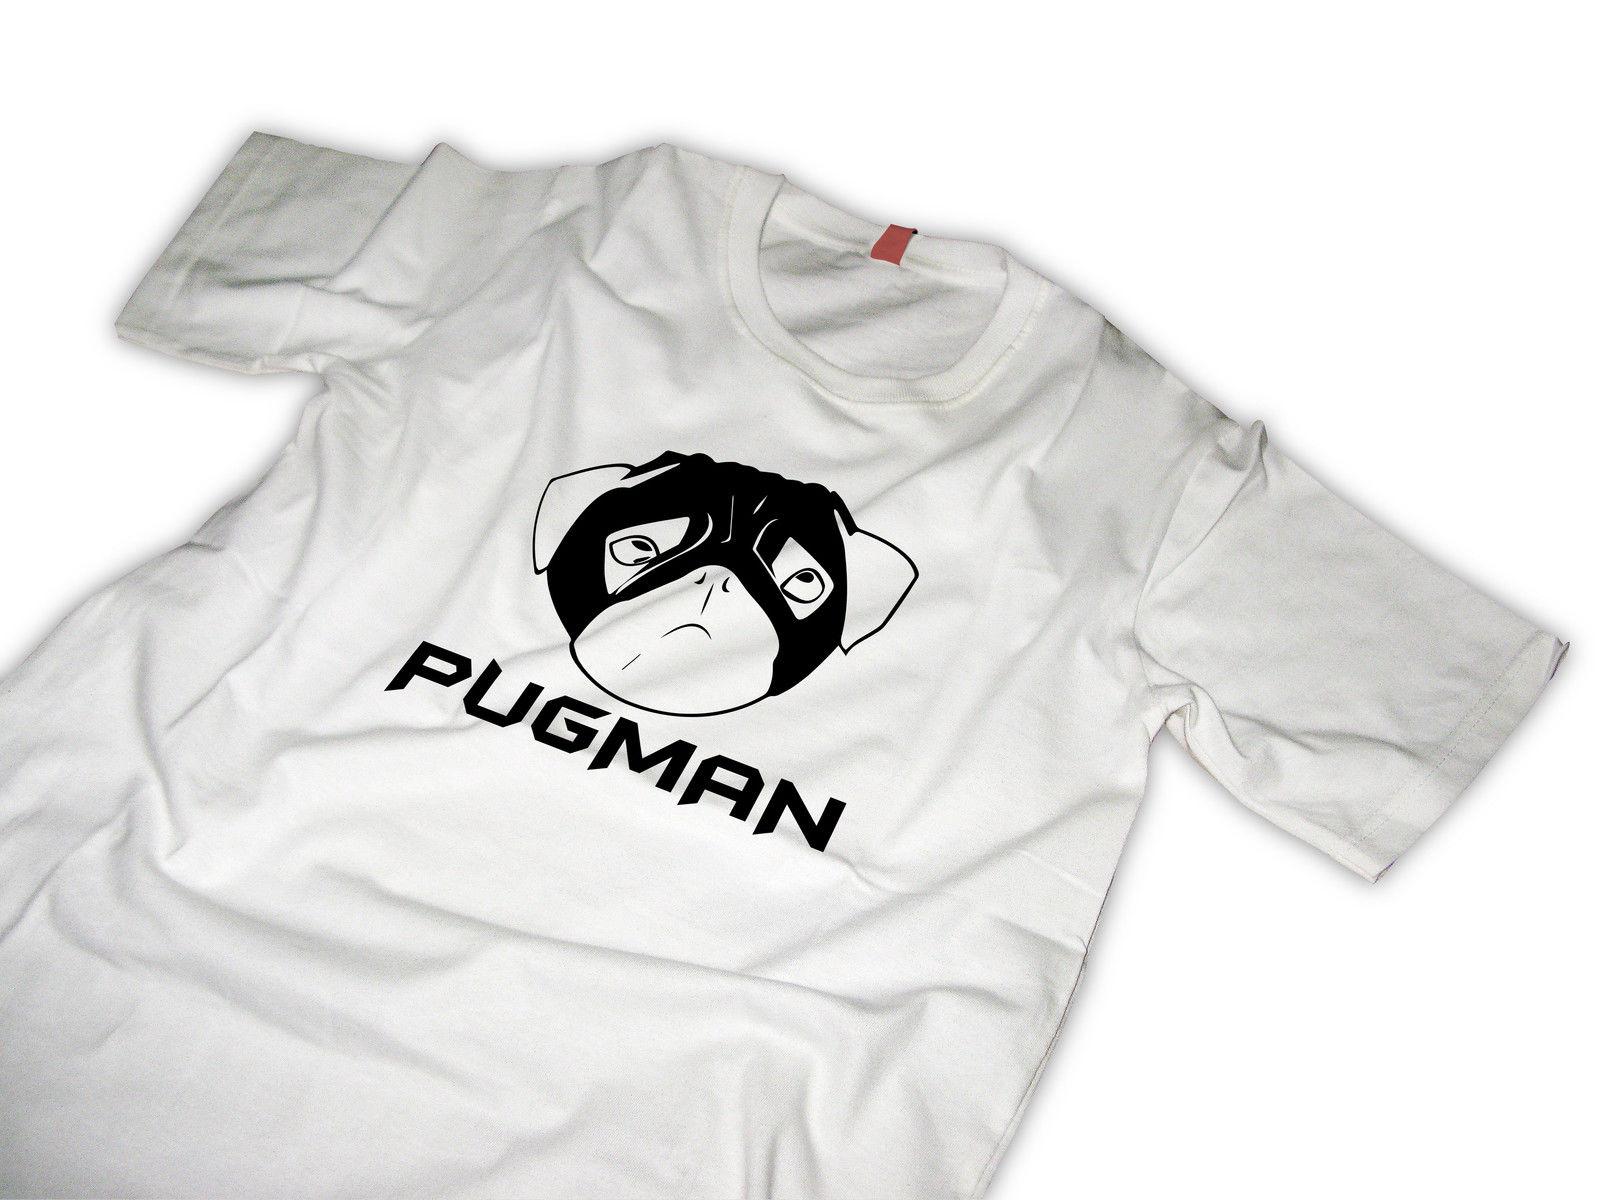 Men's Clothing Strong-Willed Pug Tshirt Pug Hero Pugman Colour Jurney Print Free Shipping T-shirt Jurney Print Cool Xxxtentacion Tshirt Brand Shirts Jeans